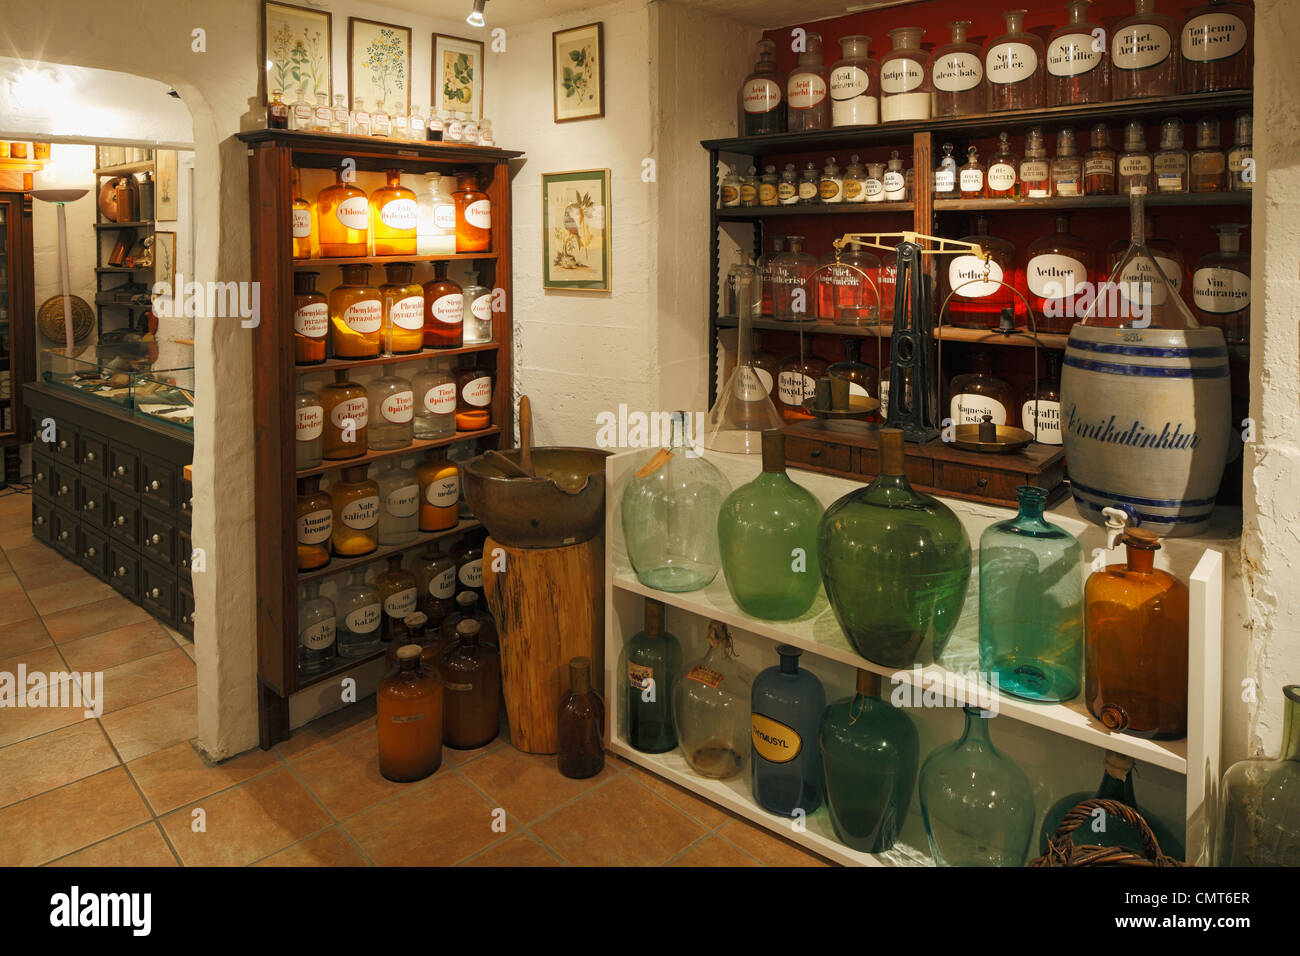 D-Dortmund, Ruhr area, Westphalia, North Rhine-Westphalia, NRW, Adler pharmacy, pharmacy museum - Stock Image